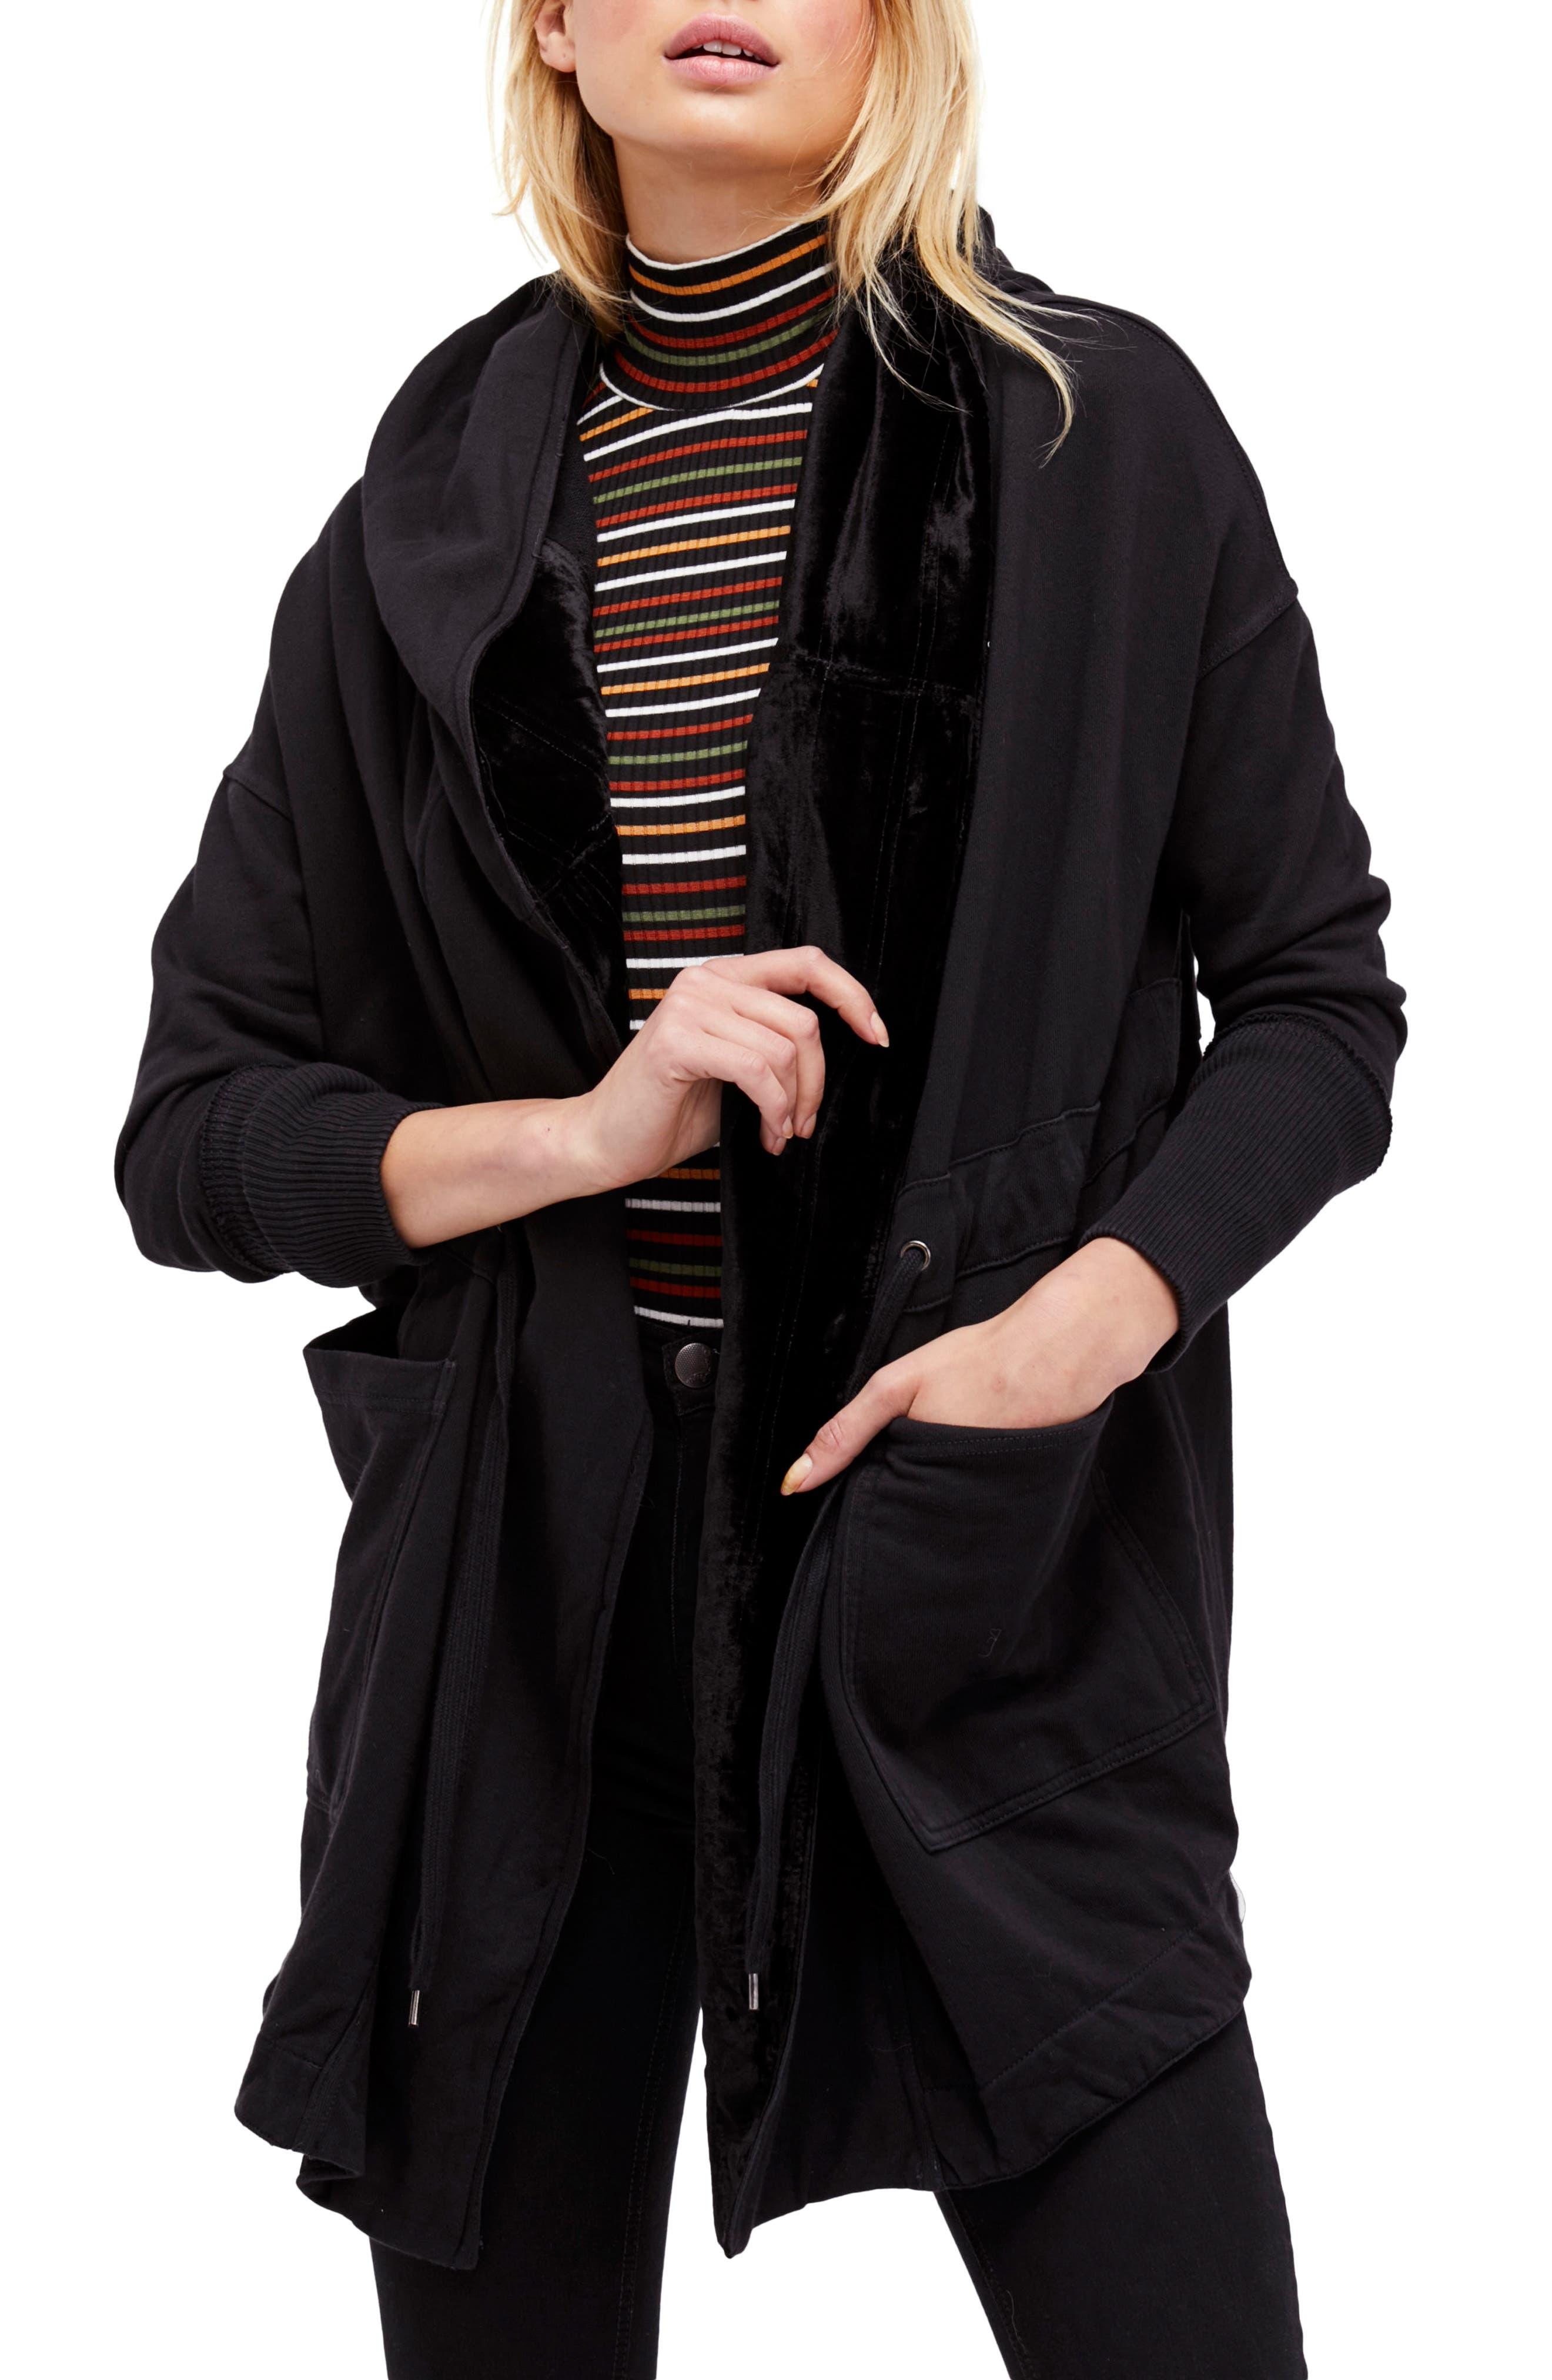 Westwood Cardigan,                         Main,                         color, Black